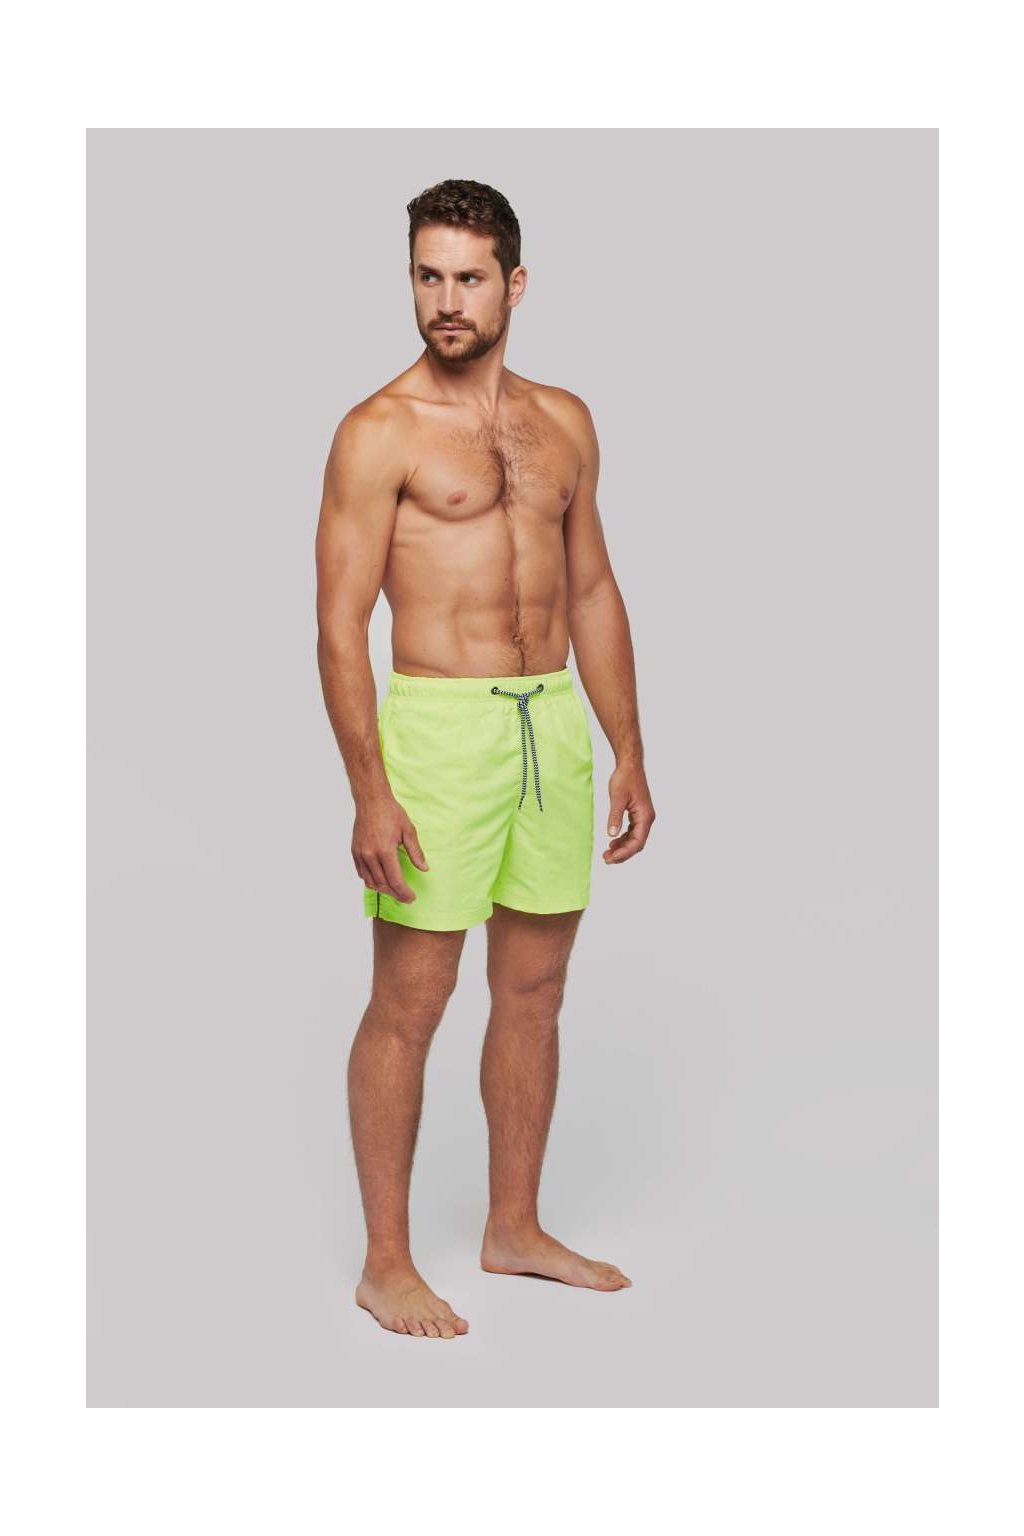 Pánské plavecké šortky SPORTY SWIMMING